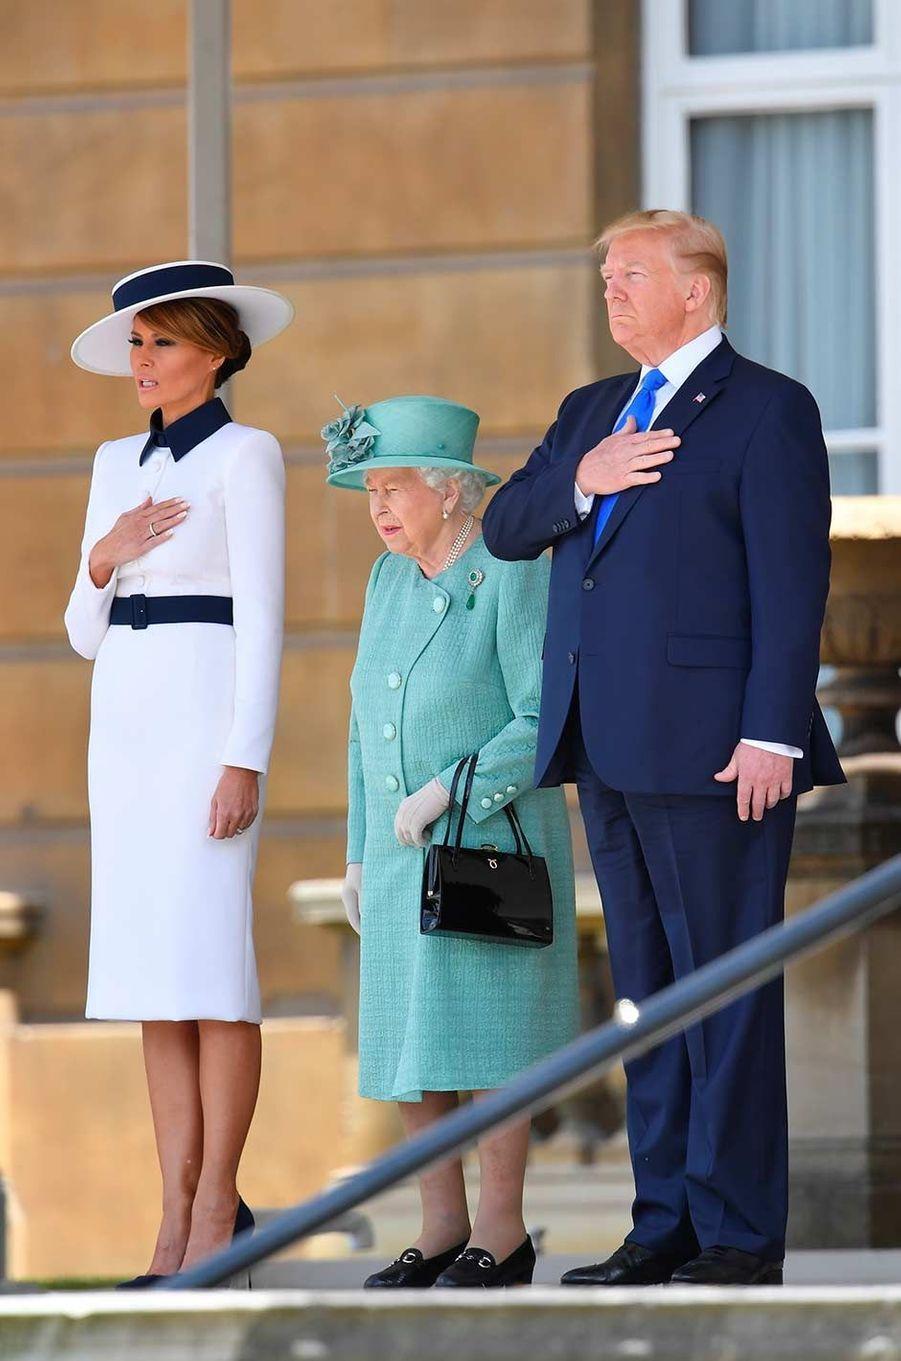 Donald et Melania Trump avec la reine Elizabeth II à Buckingham Palace, le 3 juin 2019.